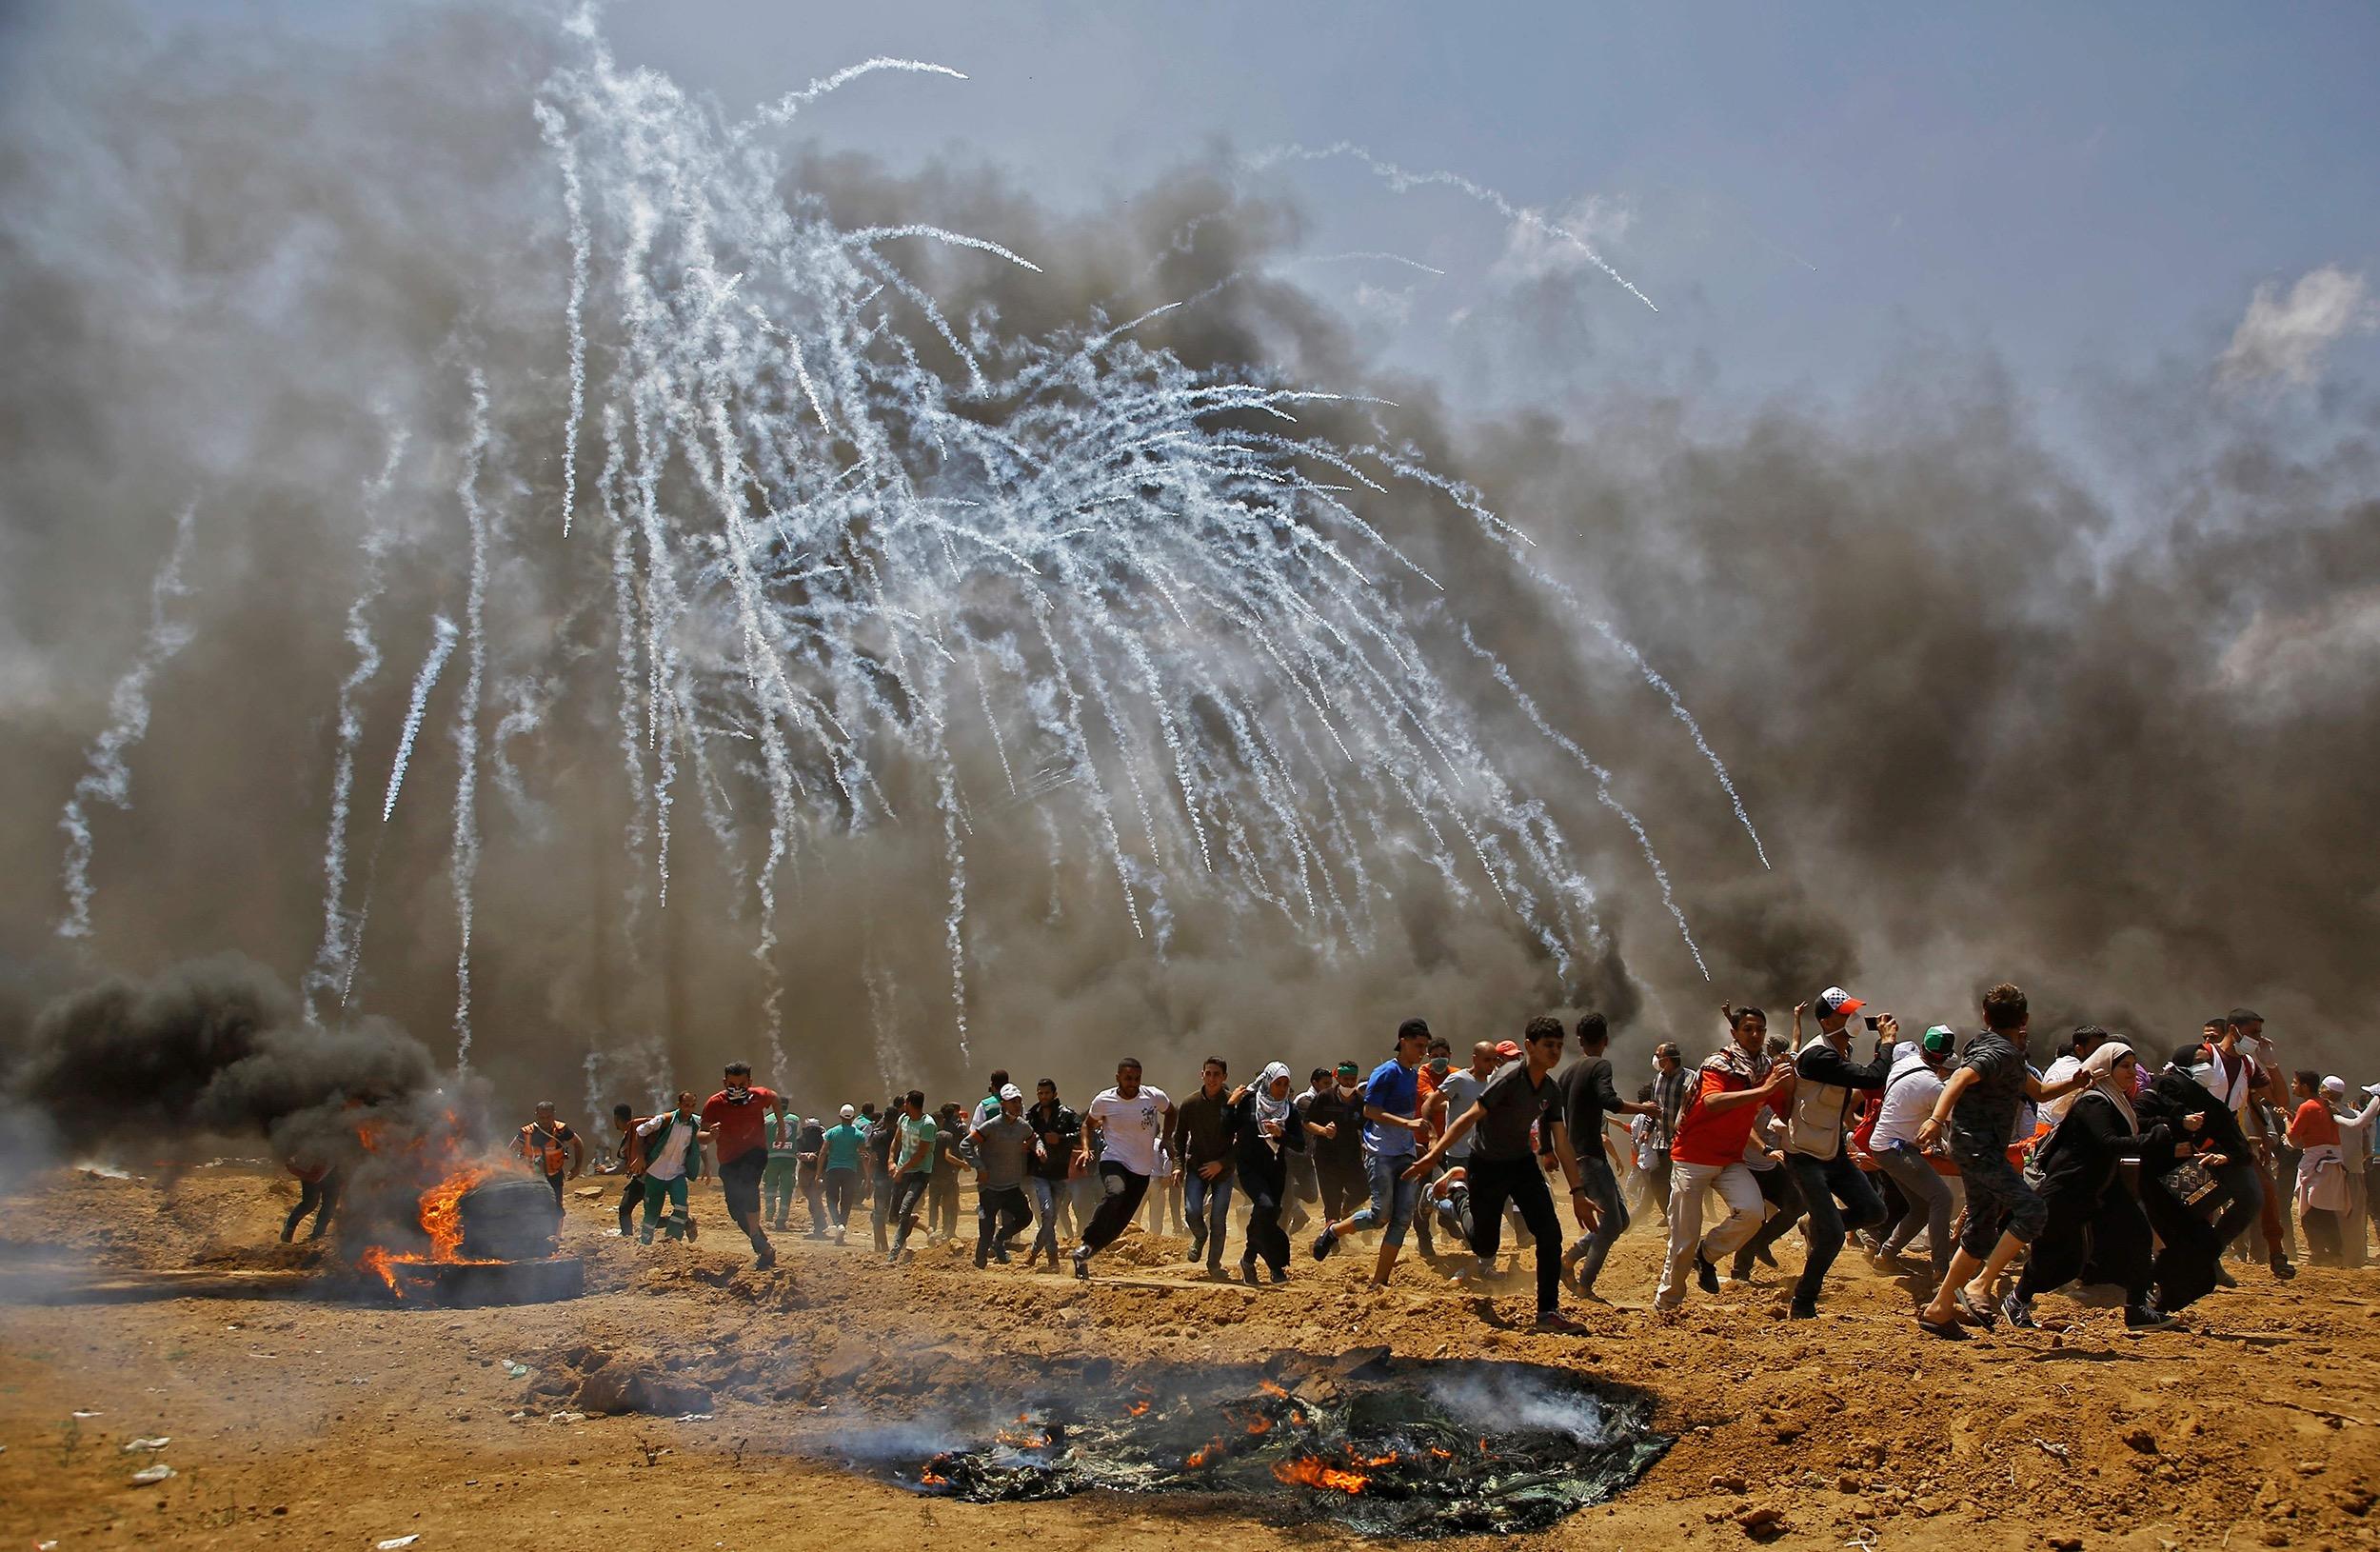 Image: PALESTINIAN-ISRAEL-US-CONFLICT-GAZA